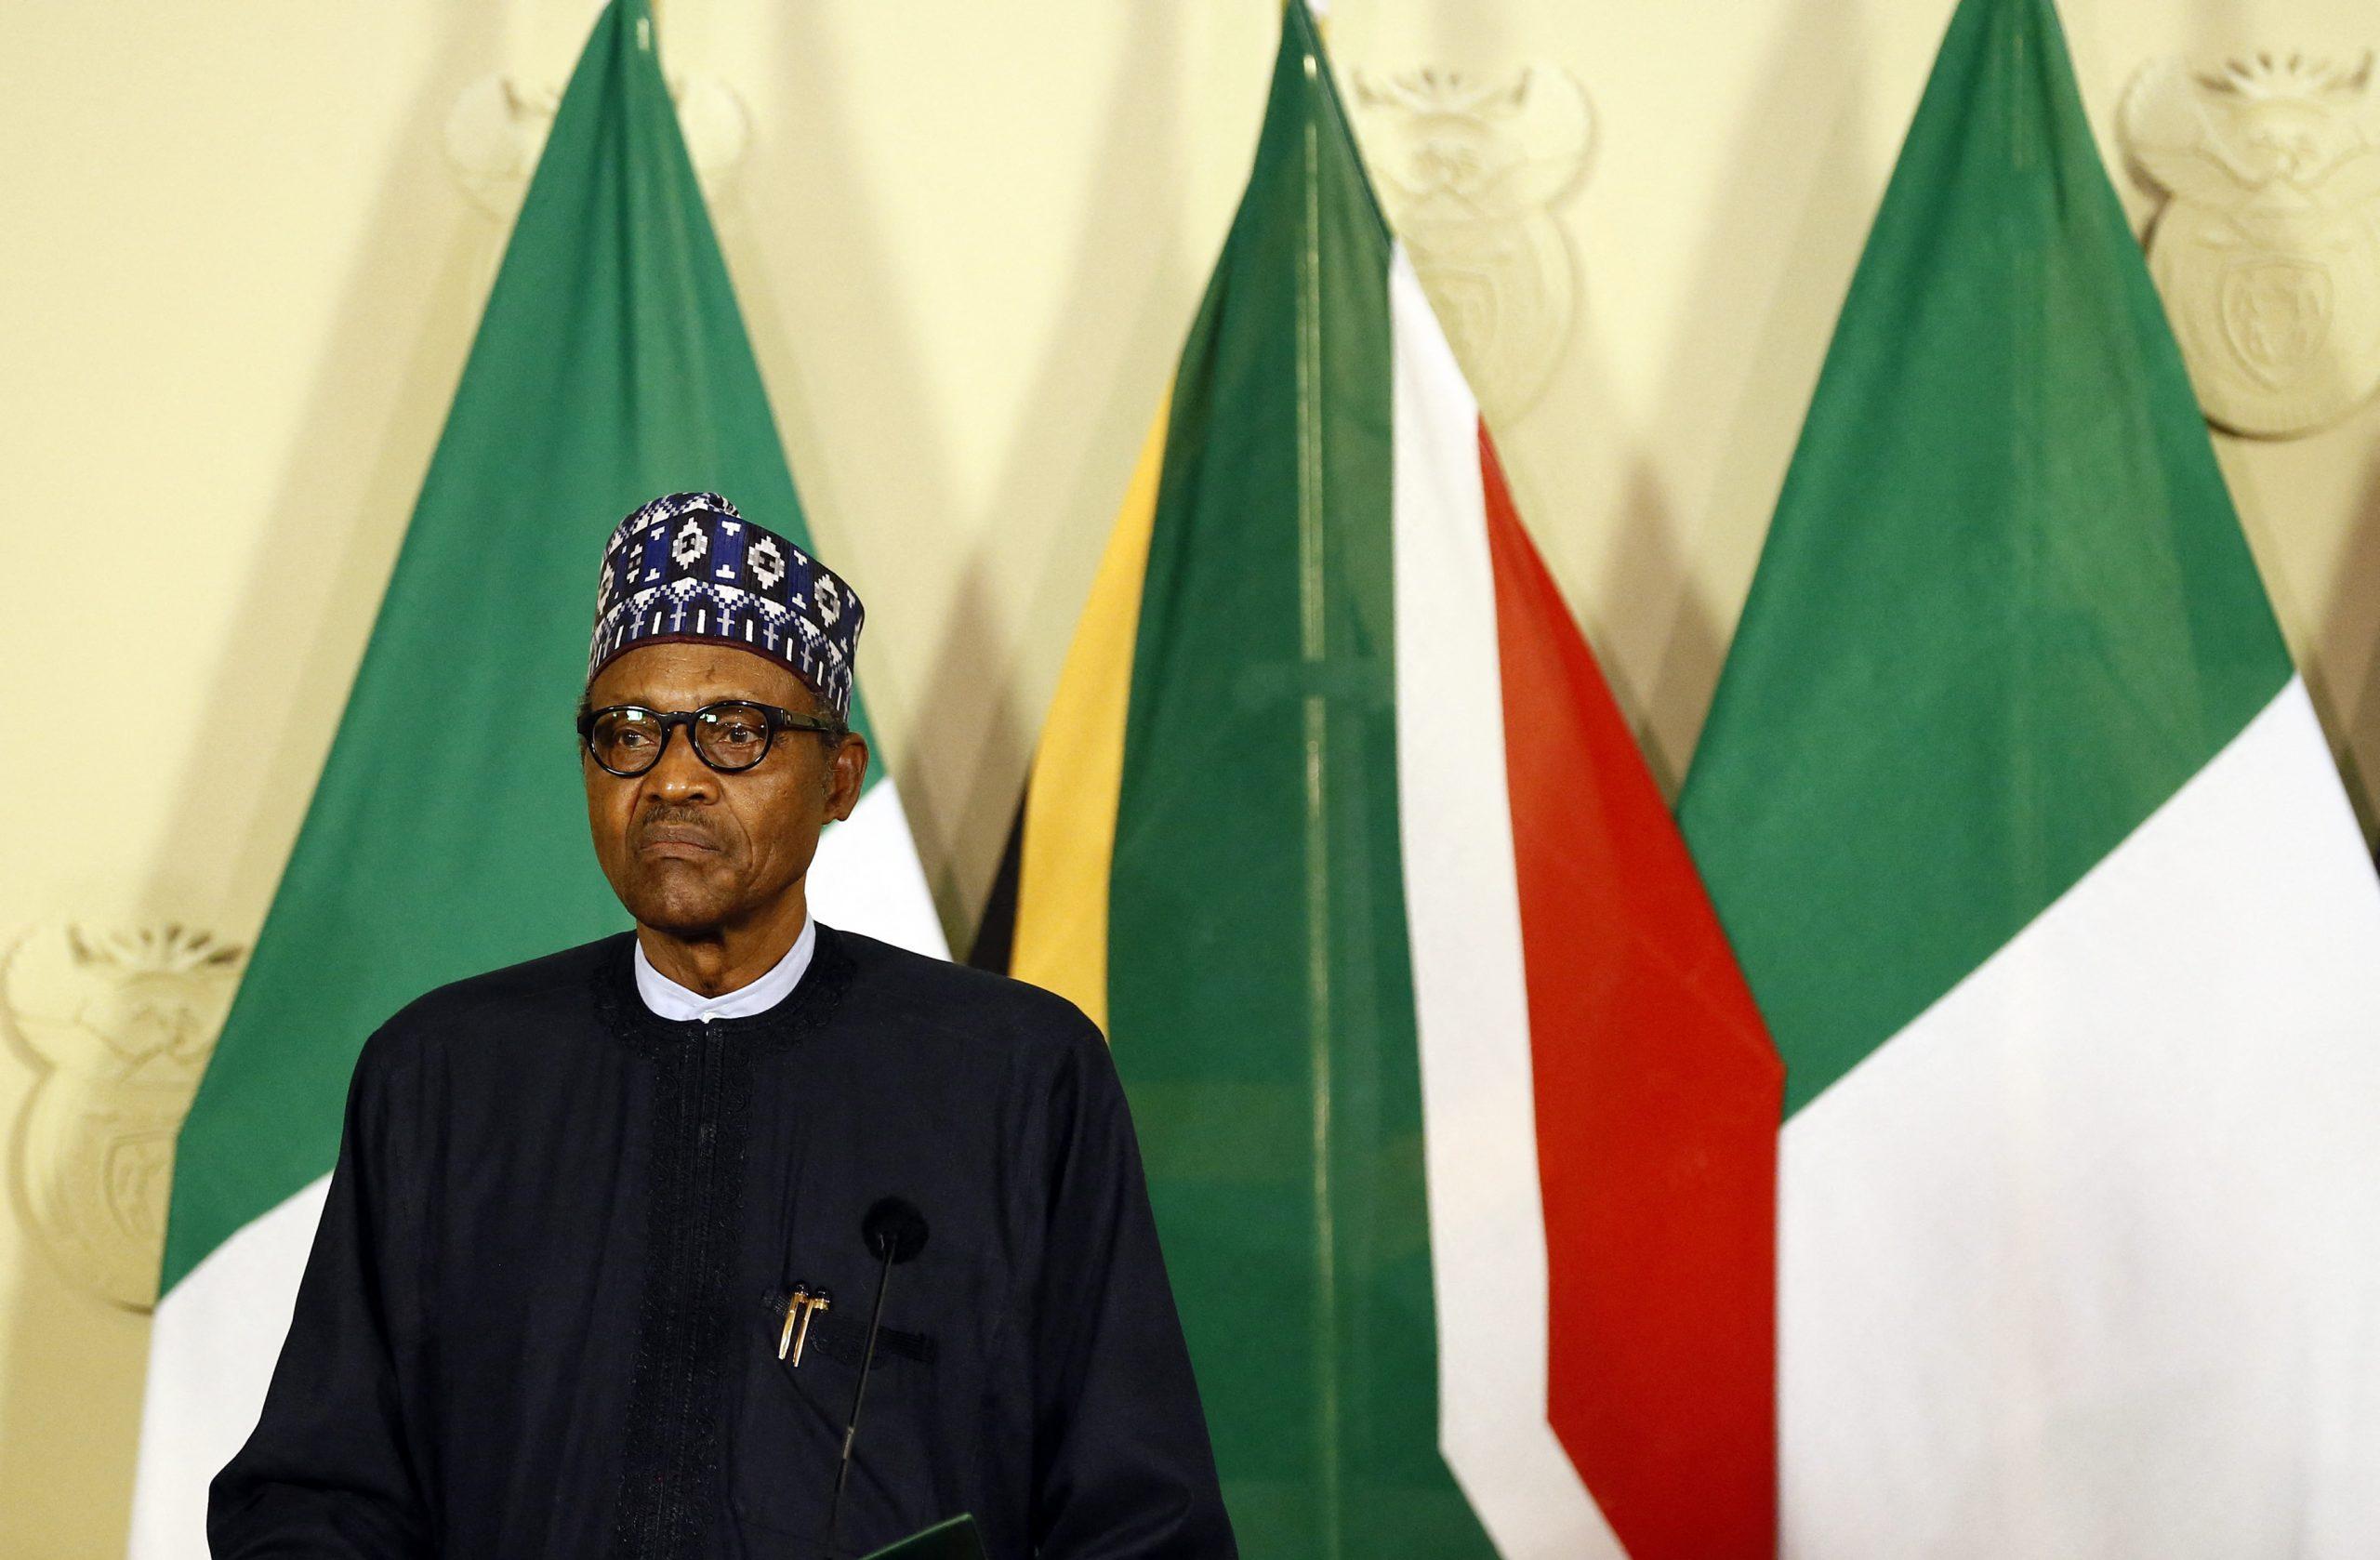 Buhari seeks debt relief, COVID-19 vaccines for Africa